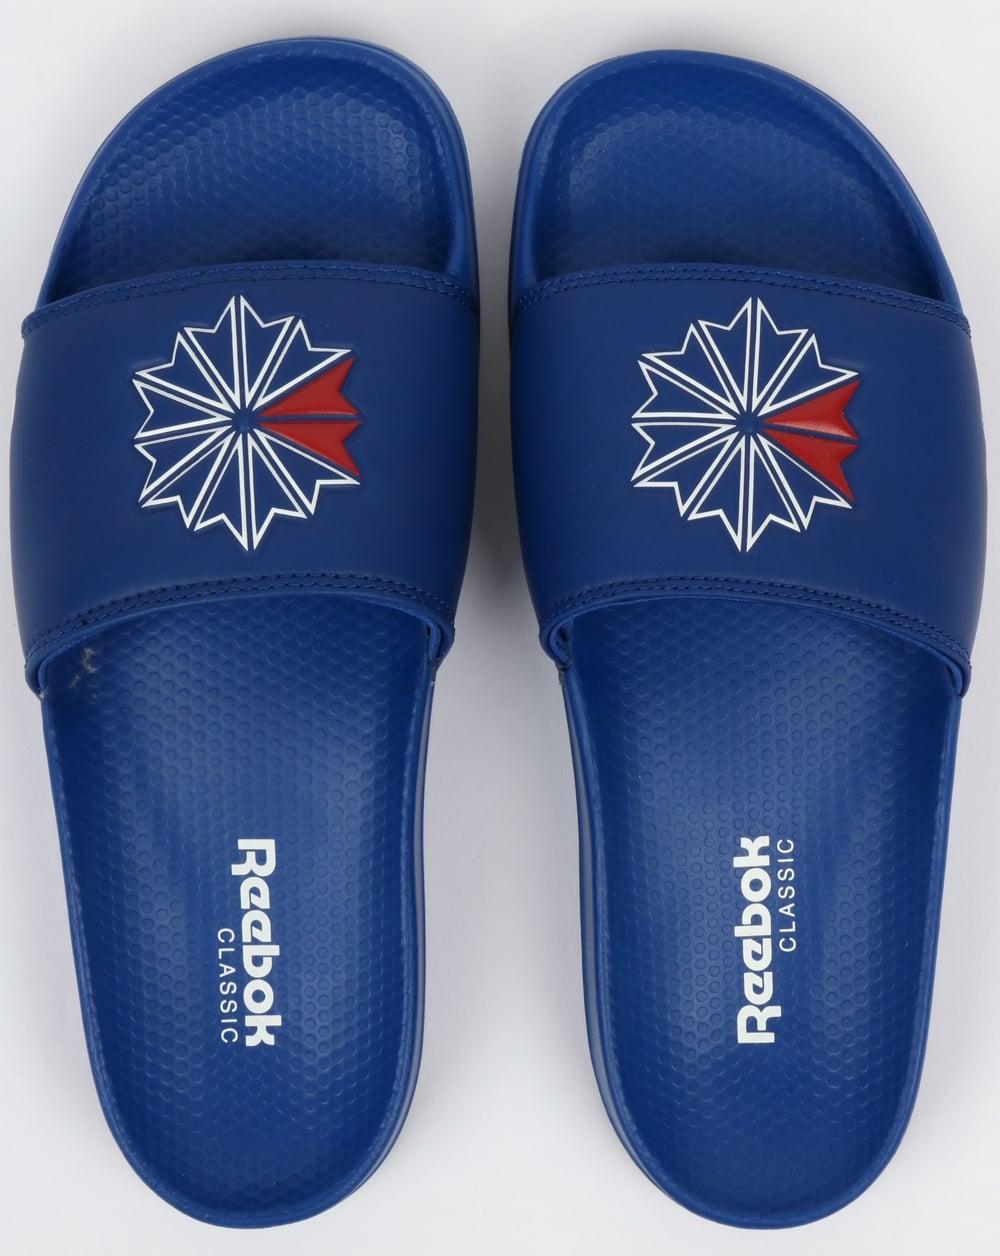 edb2852fa75 Reebok Classic Sliders Royal Blue